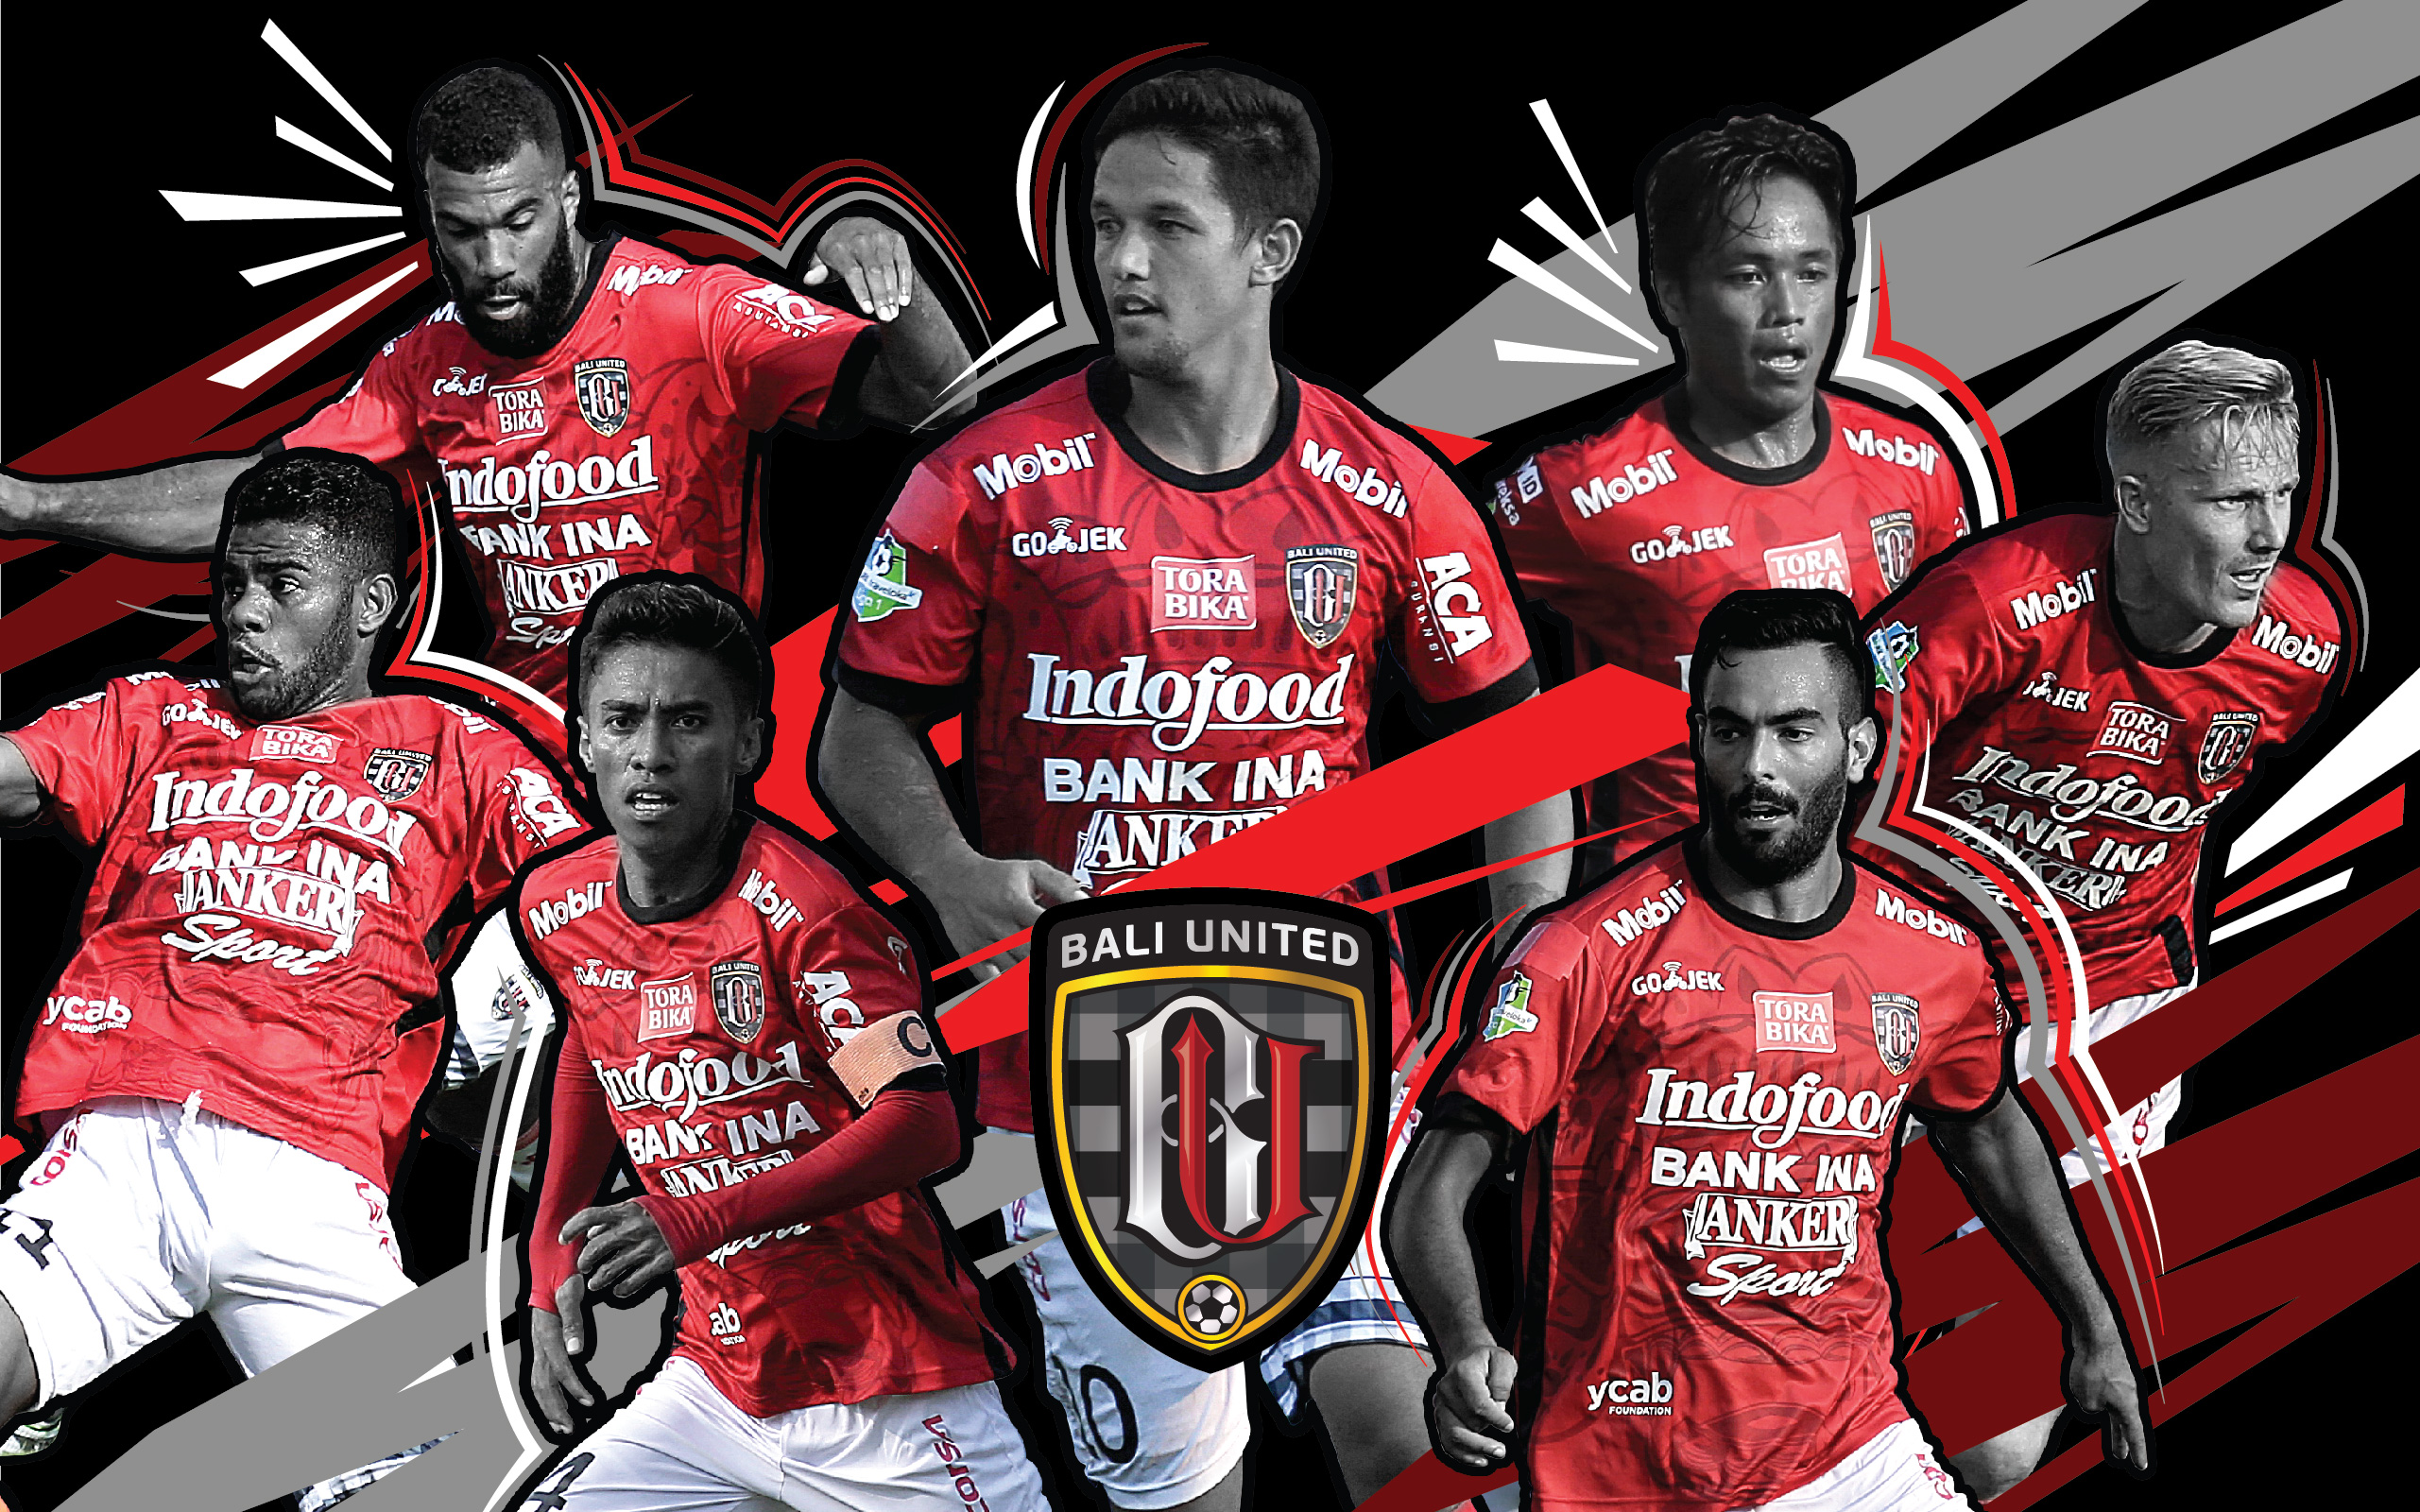 14 June Bali United 2017 HD Wallpaper